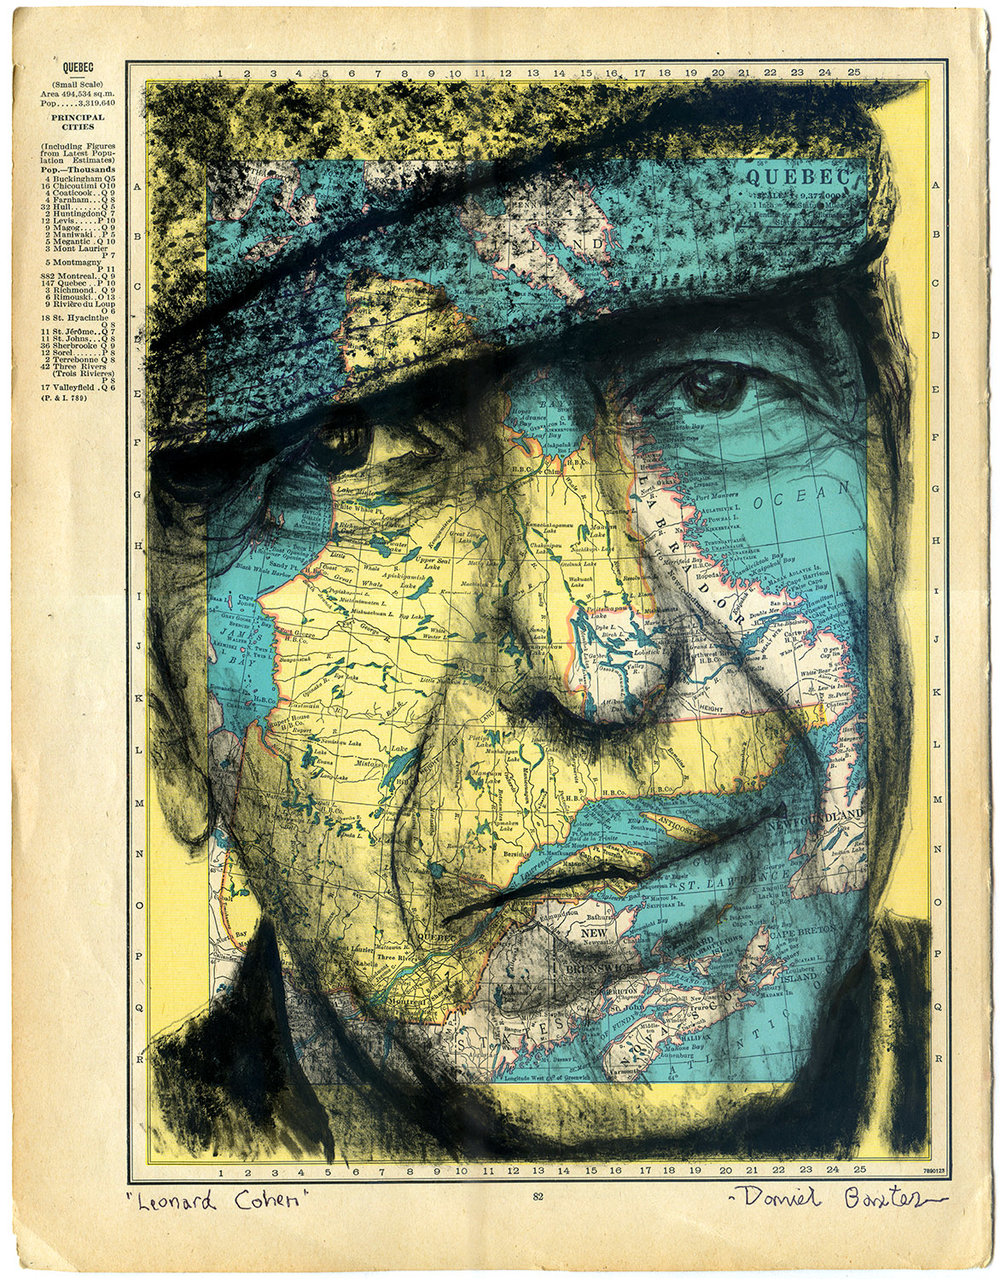 Daniel Baxter Leonard Cohen portrait.jpg